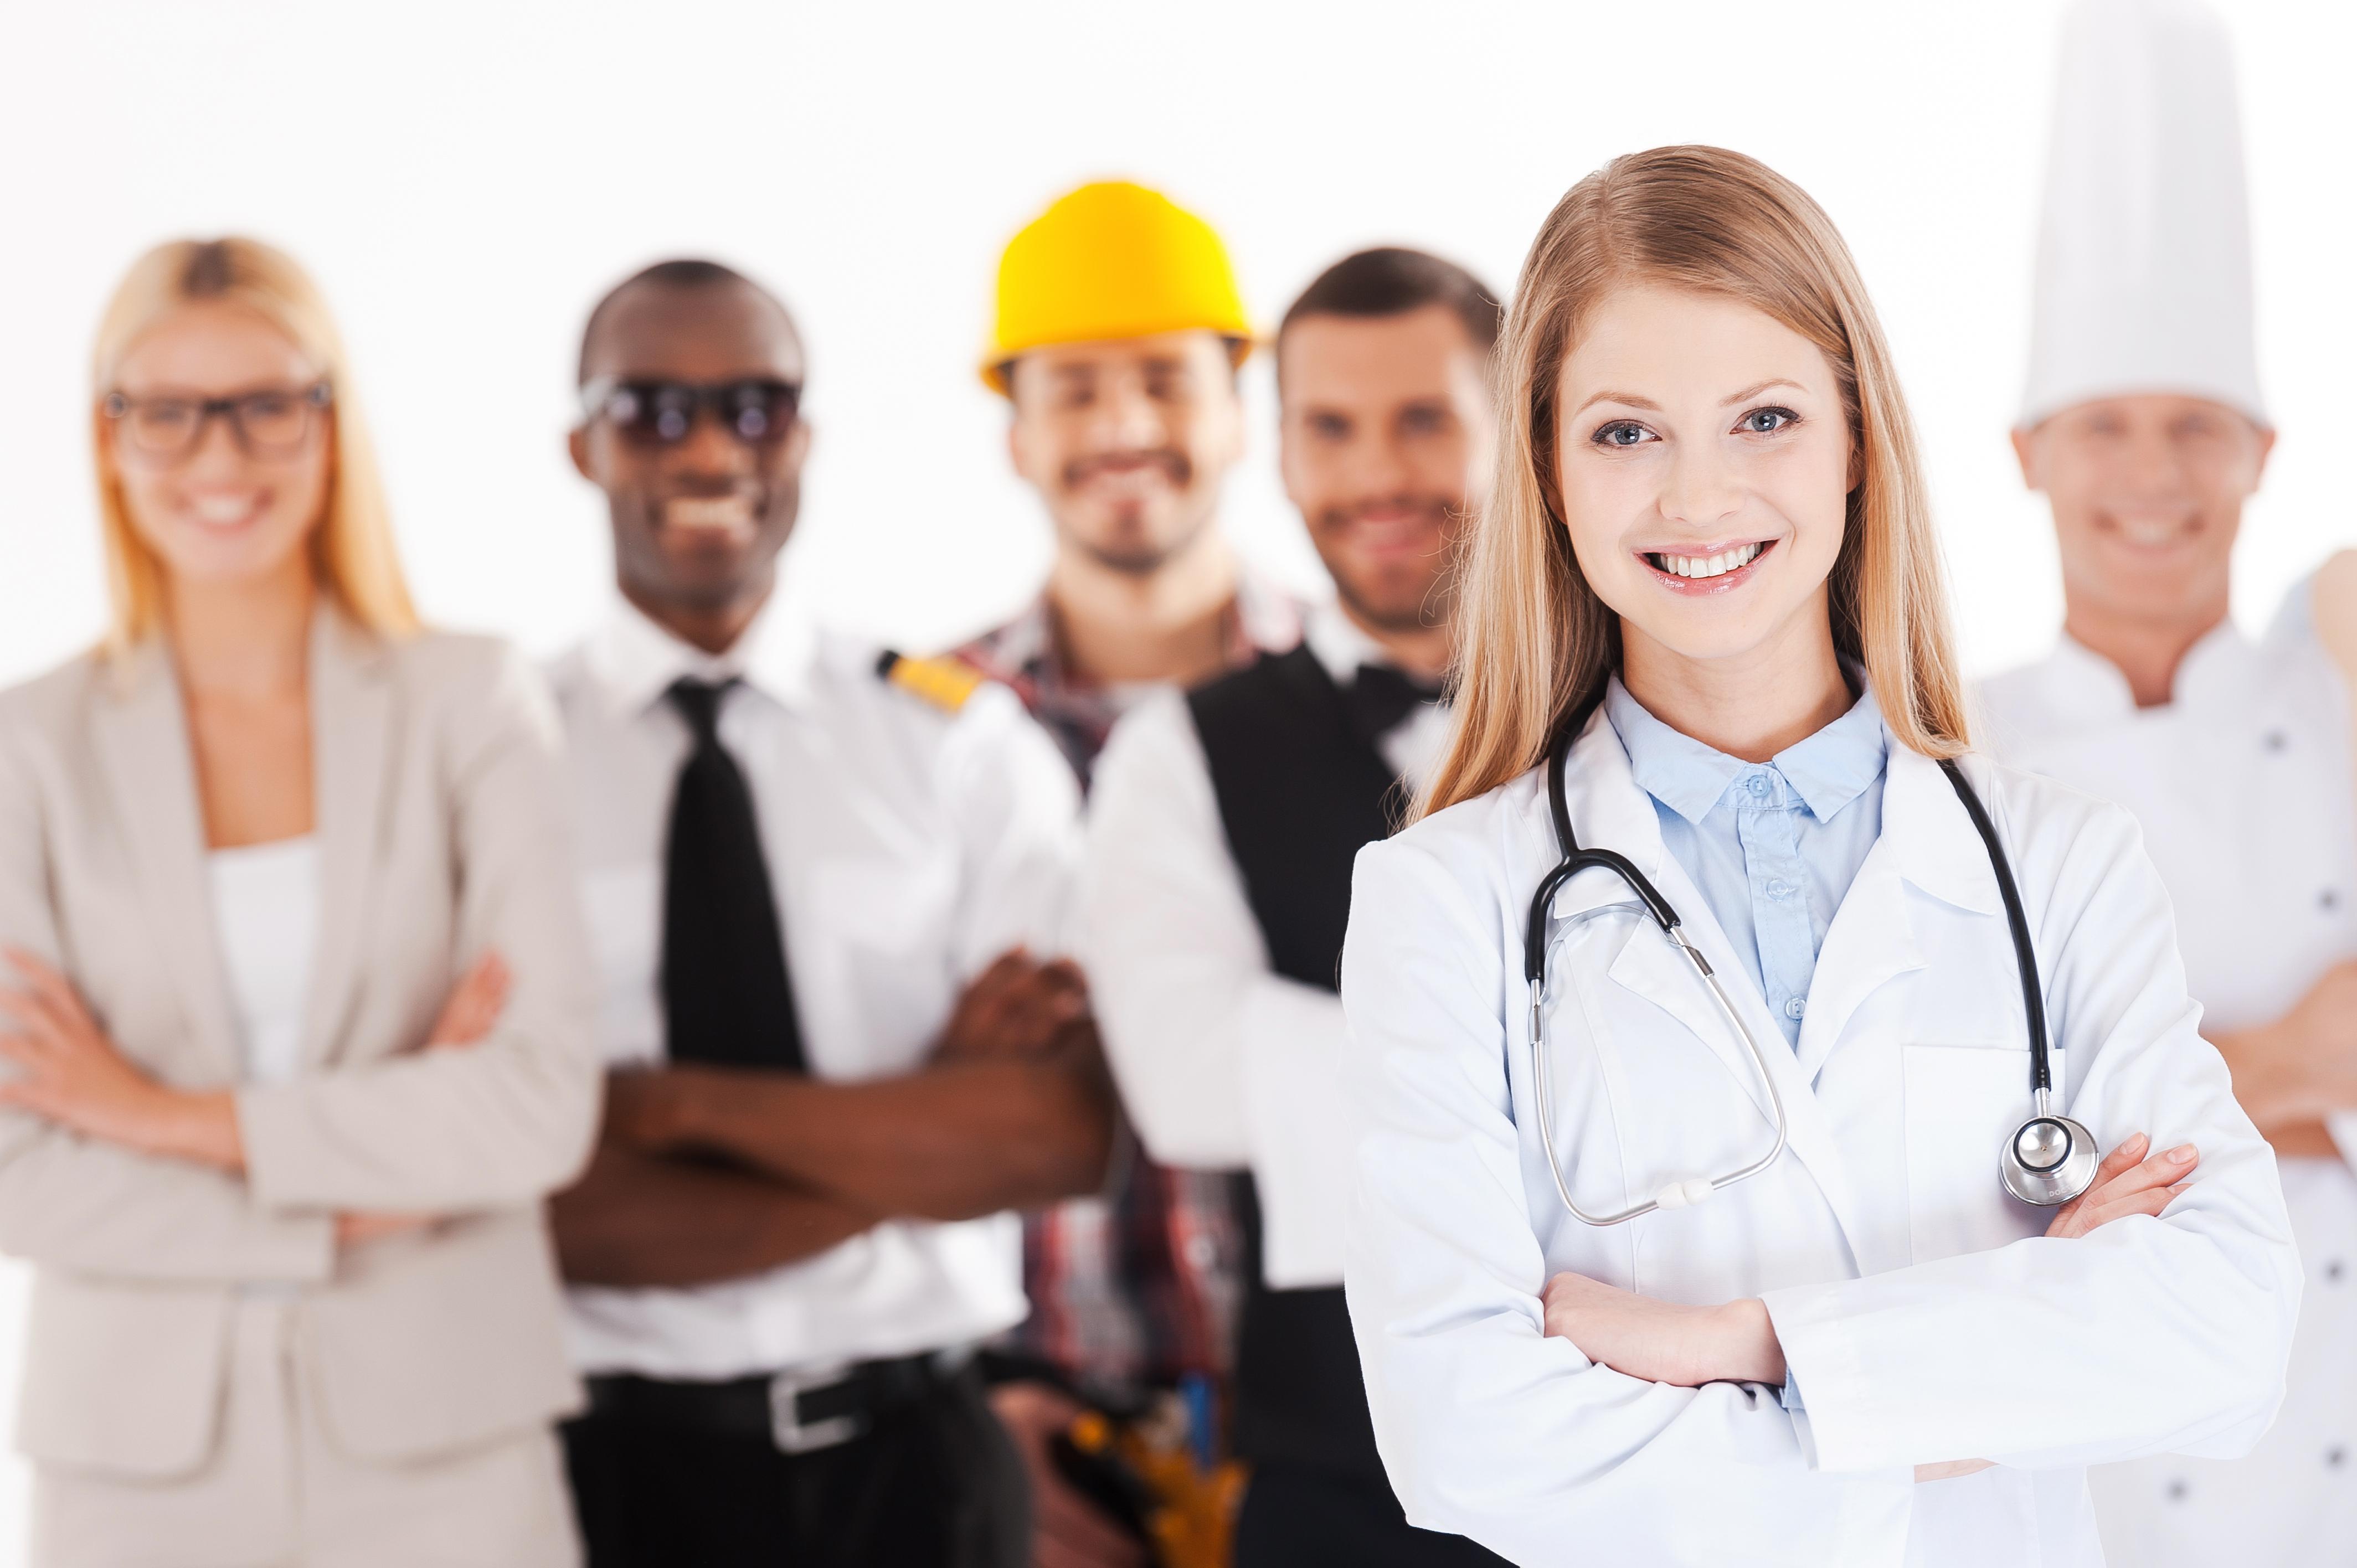 JobSeekers - Leading The Way Through Career